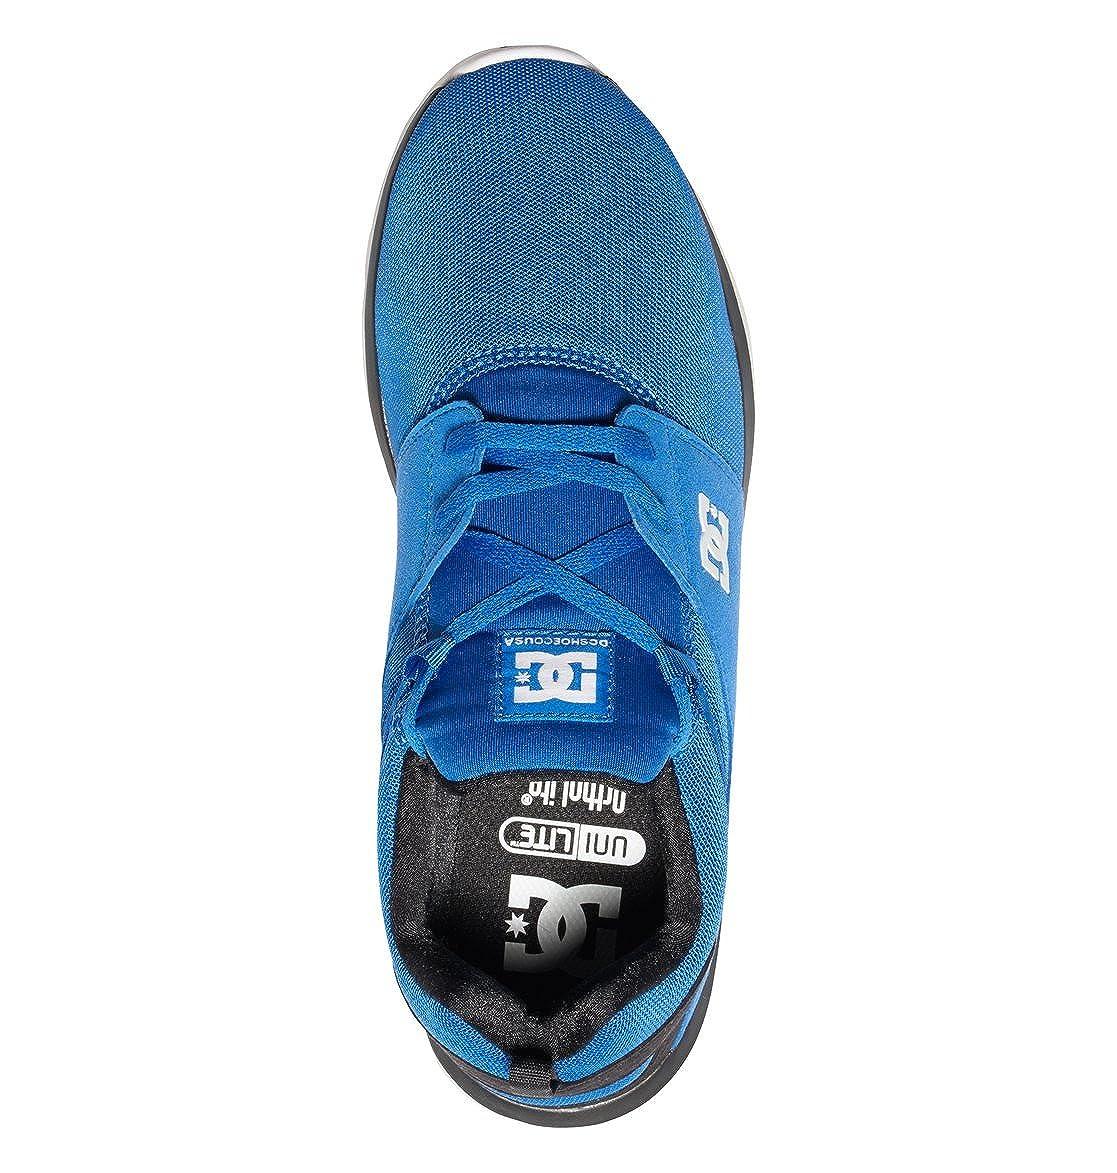 Shoes Adys700071 DC Shoes Mens Shoes Heathrow